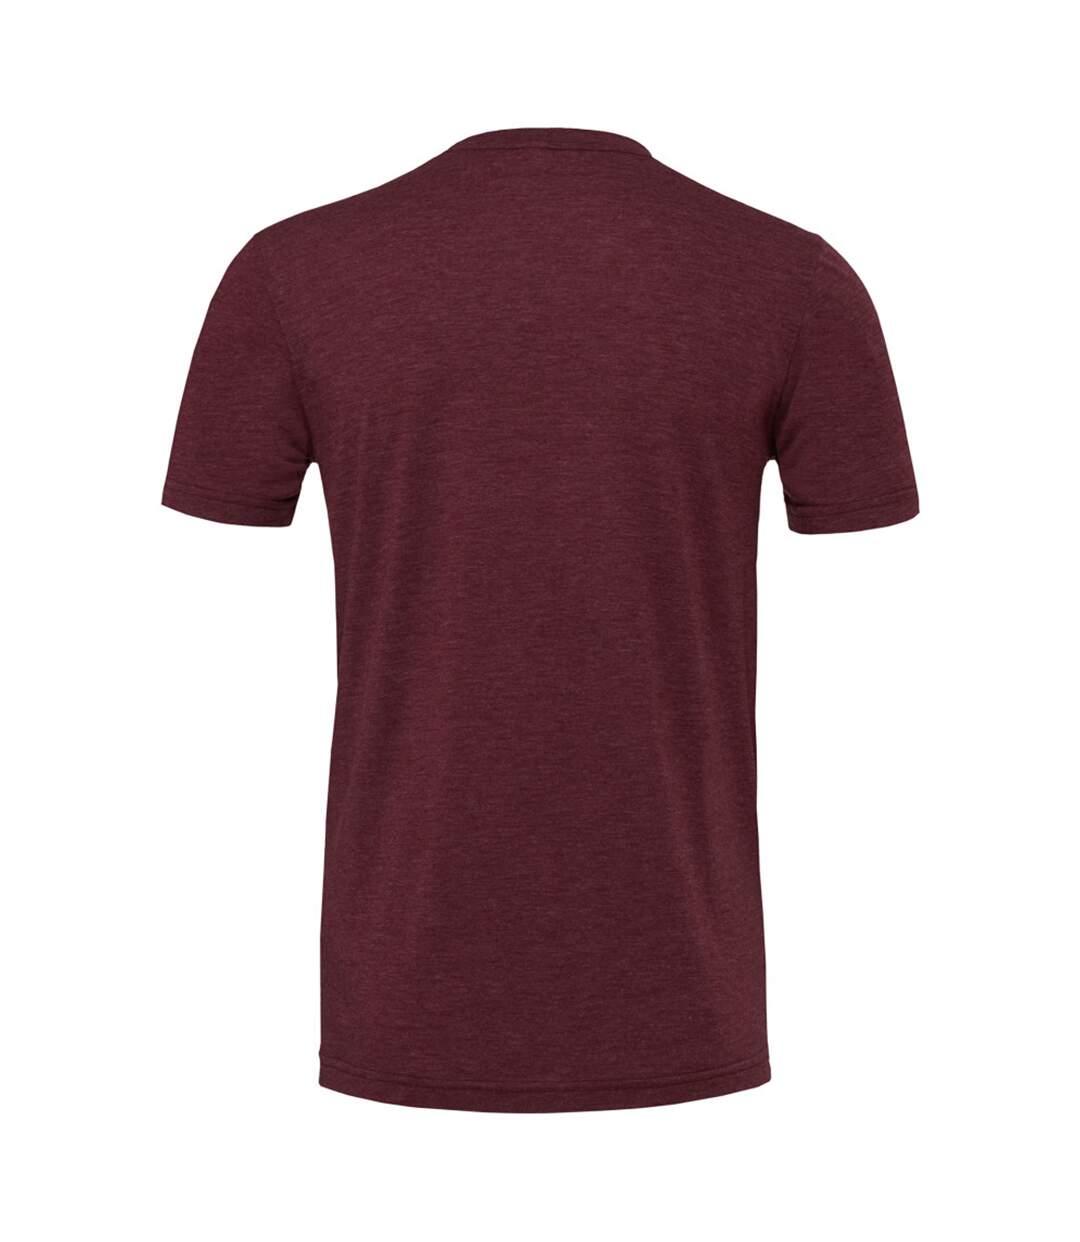 Canvas Mens Triblend Crew Neck Plain Short Sleeve T-Shirt (Maroon Triblend) - UTBC2596